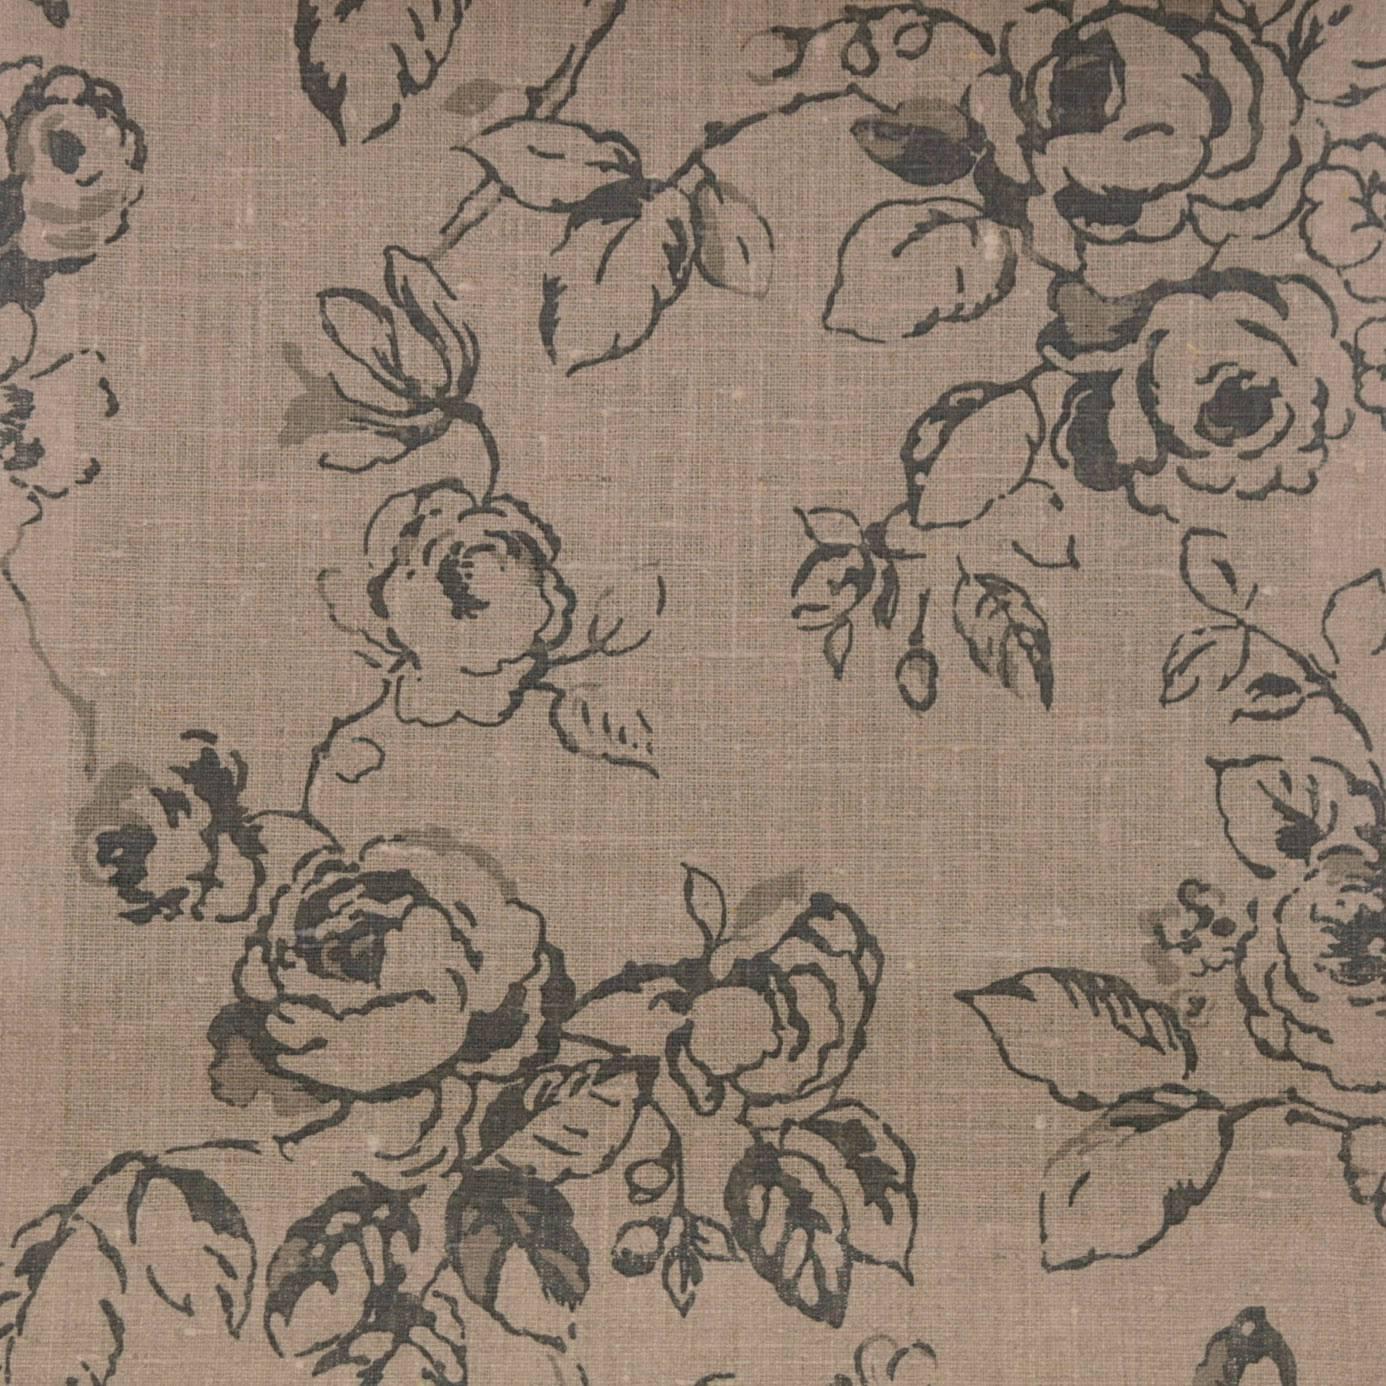 delphine fabric linen f0428 03 clarke clarke clarisse fabrics collection. Black Bedroom Furniture Sets. Home Design Ideas